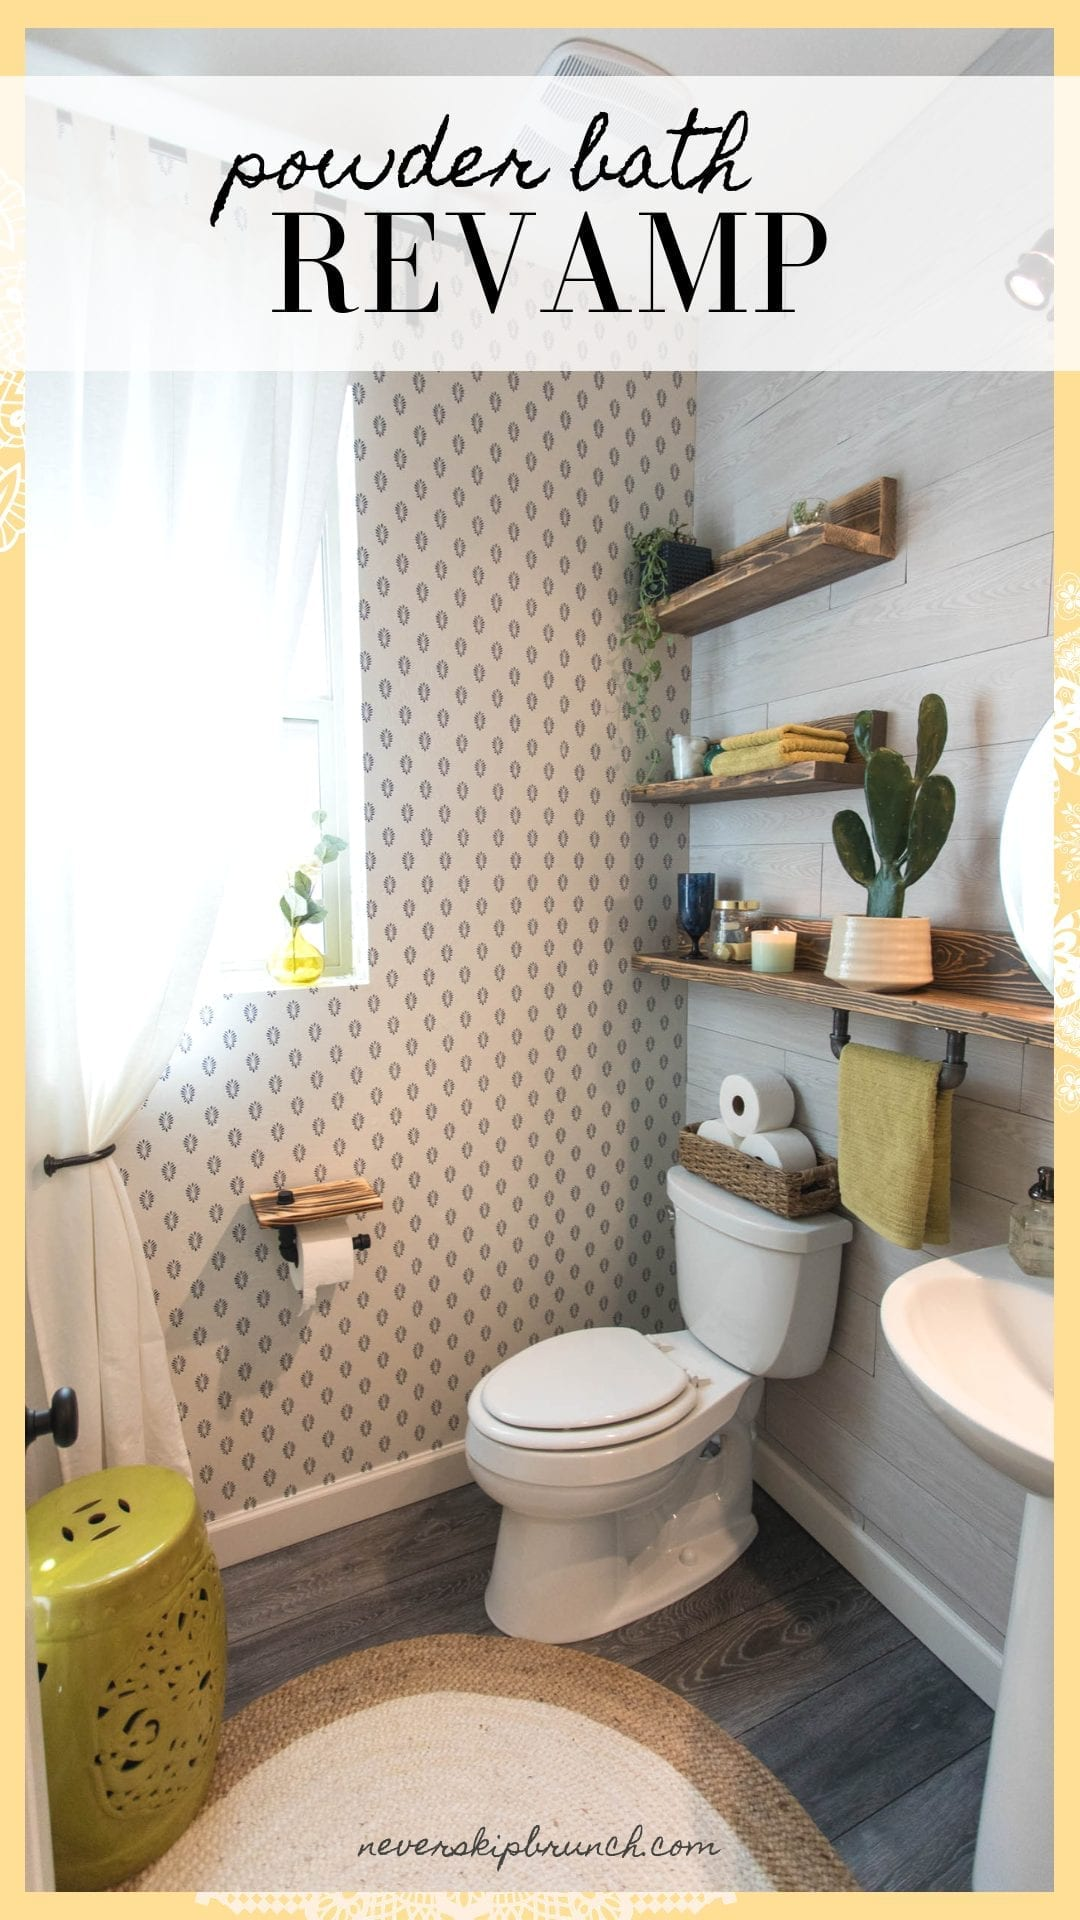 This Powder bath makeover gives you small powder bathroom ideas for transforming your space with elegant industrial powder bath decor   Never Skip Brunch by Cara Newhart #design #decor #interiordesign